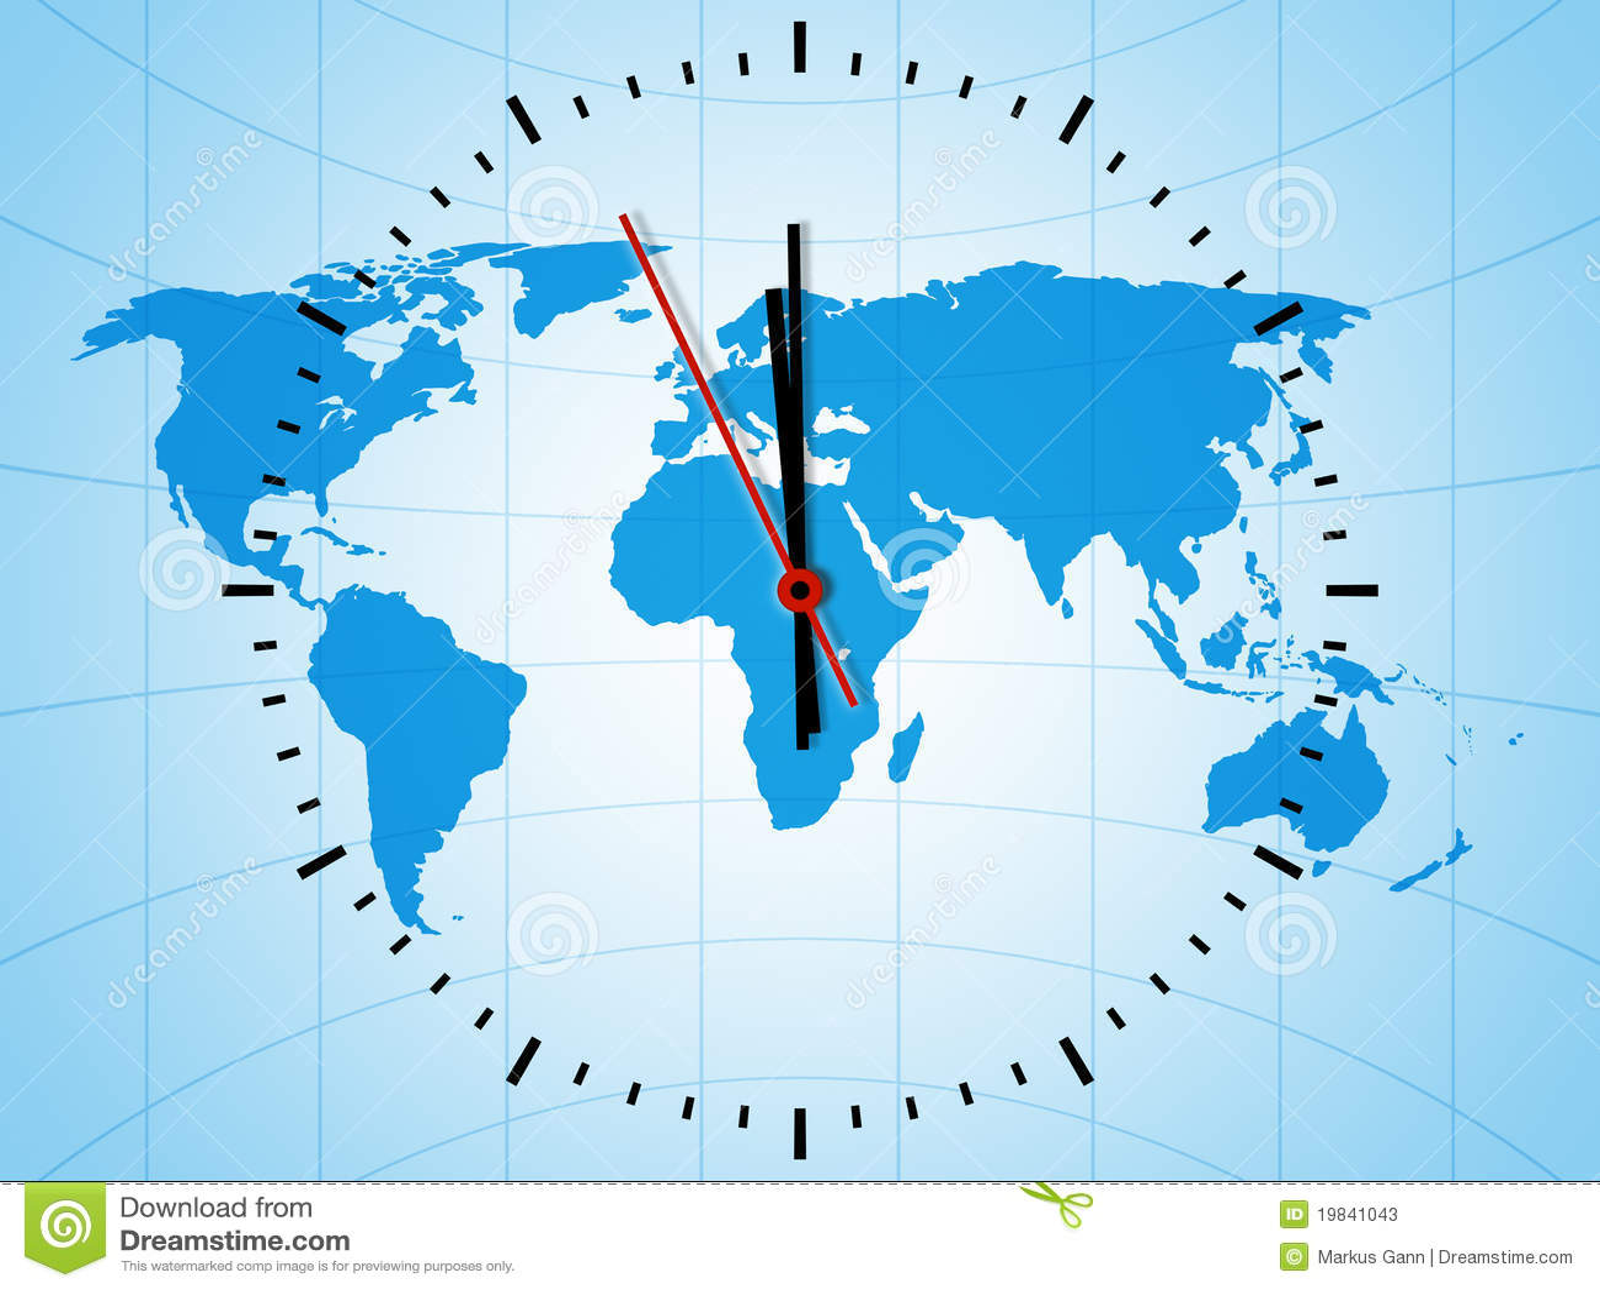 World Clock Stock Photos - Image: 19841043